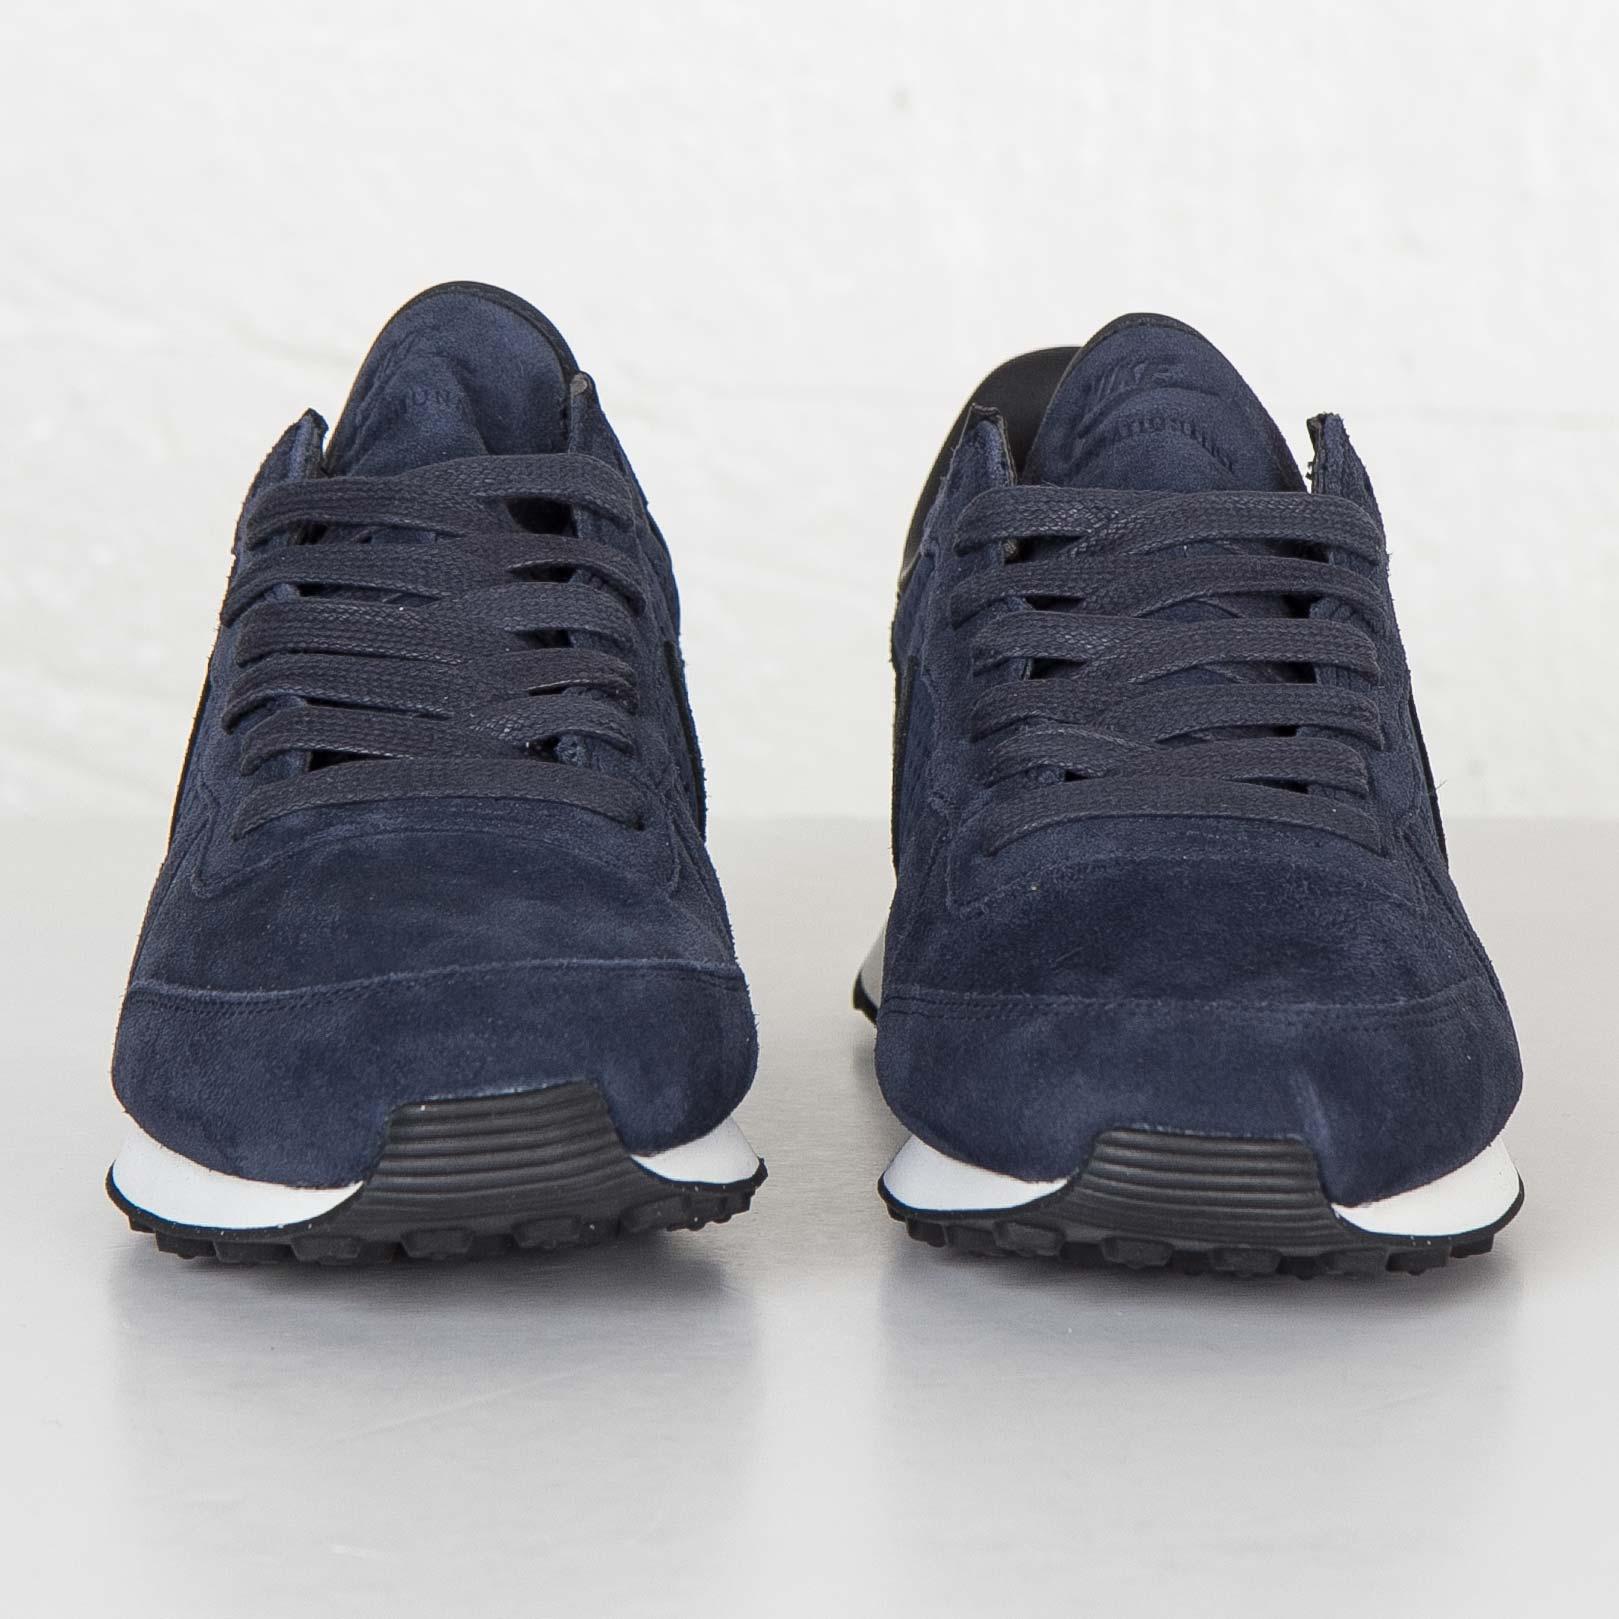 lowest price 9b986 99fc9 Nike Internationalist LX - 827888-400 - Sneakersnstuff   sneakers    streetwear på nätet sen 1999